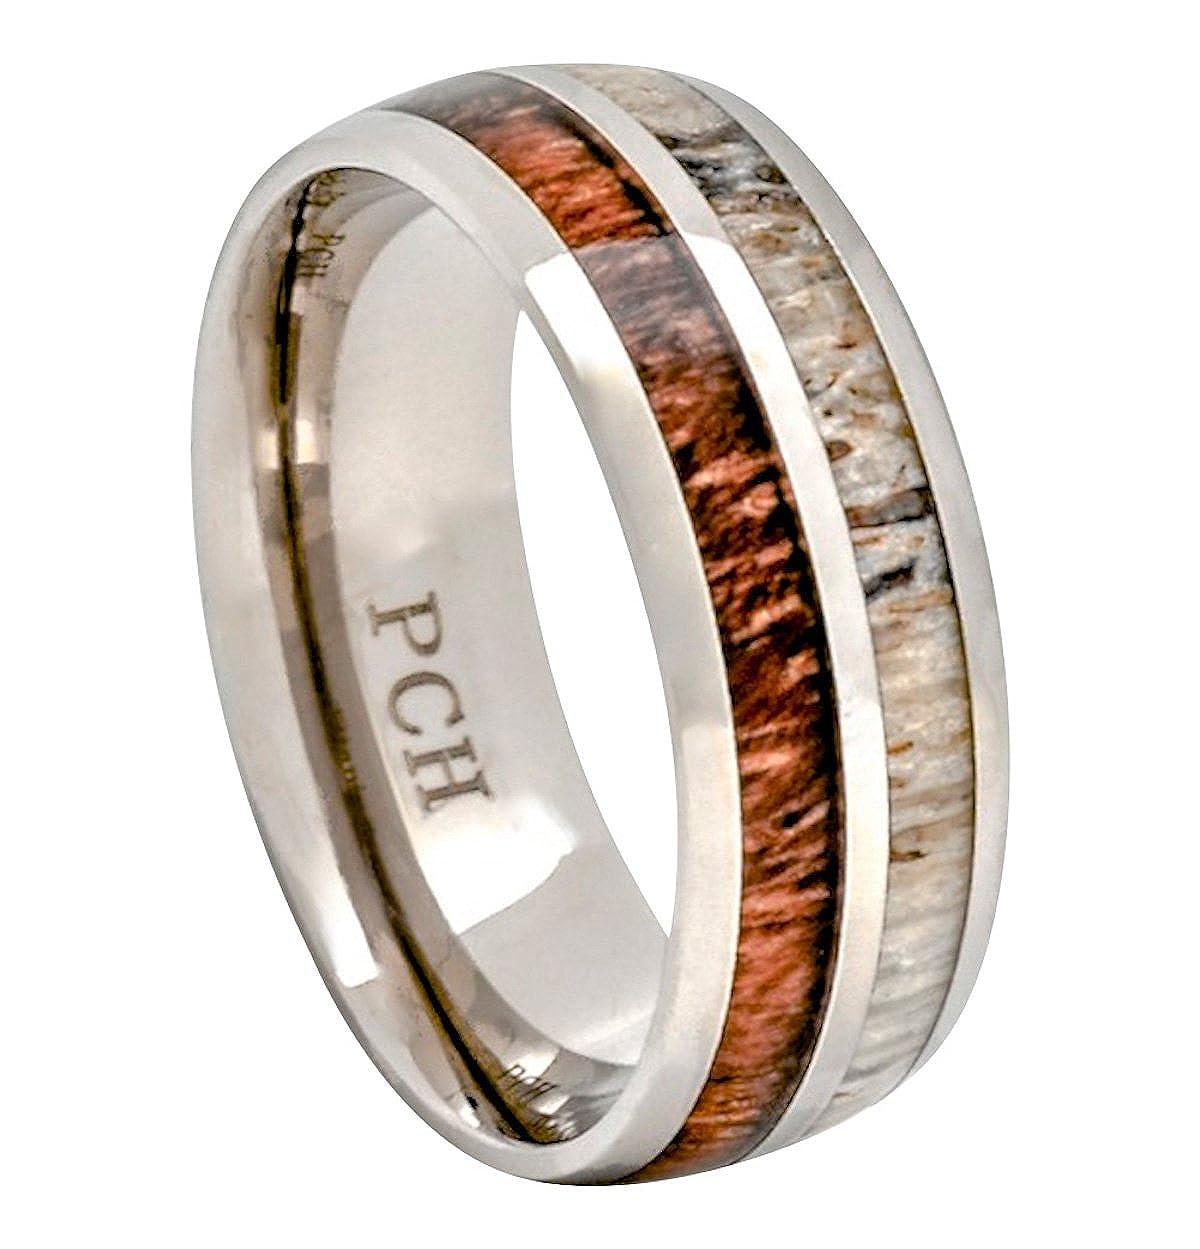 b0cc5f1c94220 PCH Jewelers Deer Antler and Koa Wood Ring Titanium Mens Wedding Band  Comfort Fit